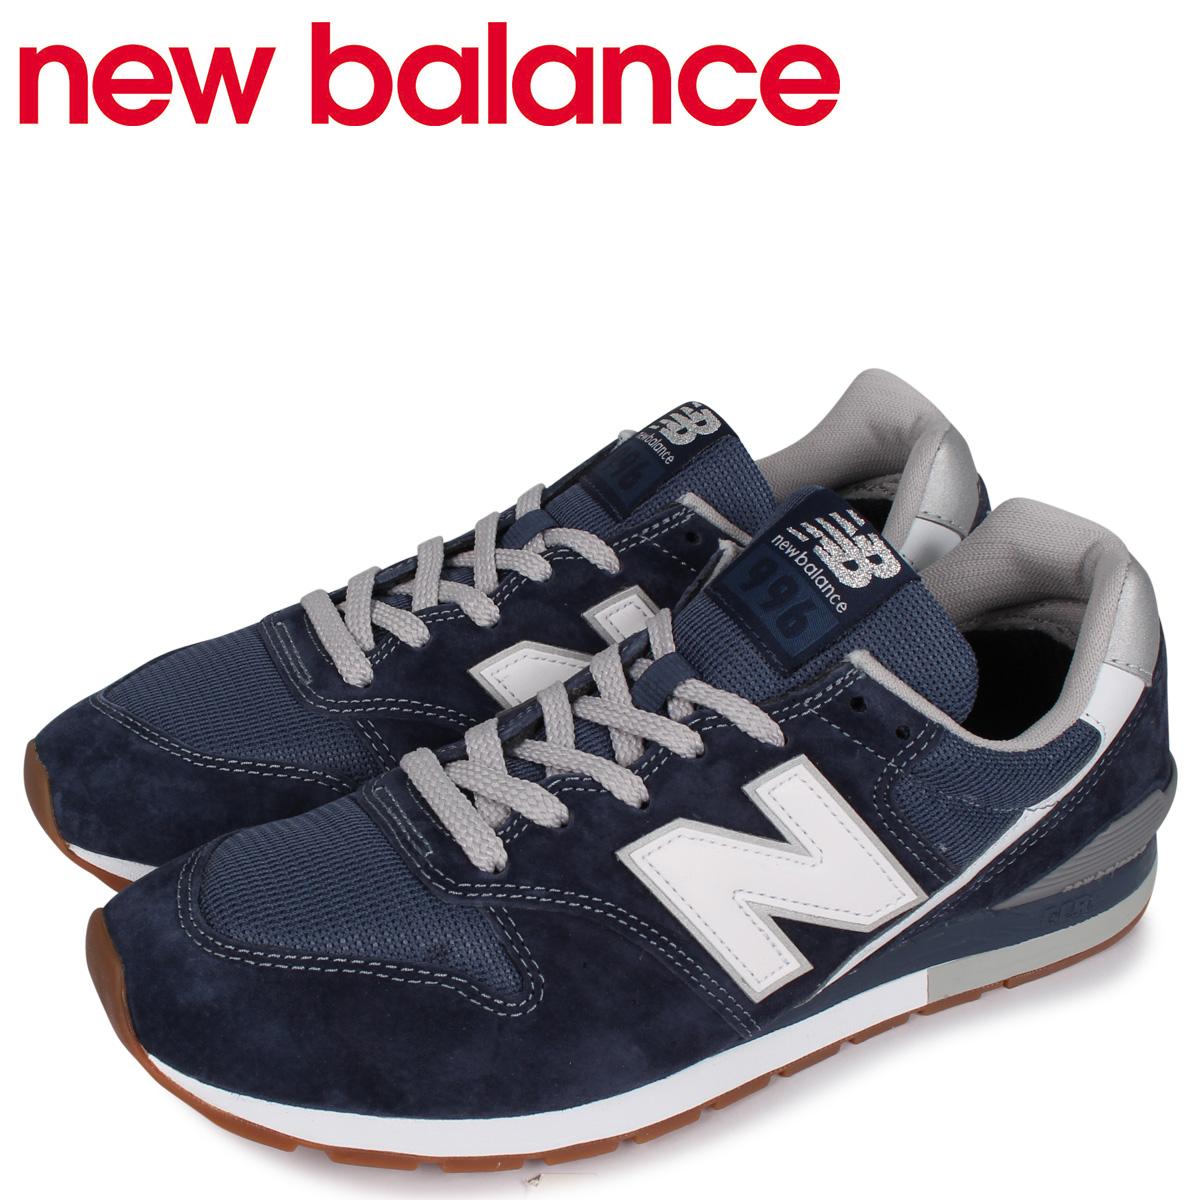 new balance ニューバランス 996 スニーカー メンズ Dワイズ ネイビー CM996SMN